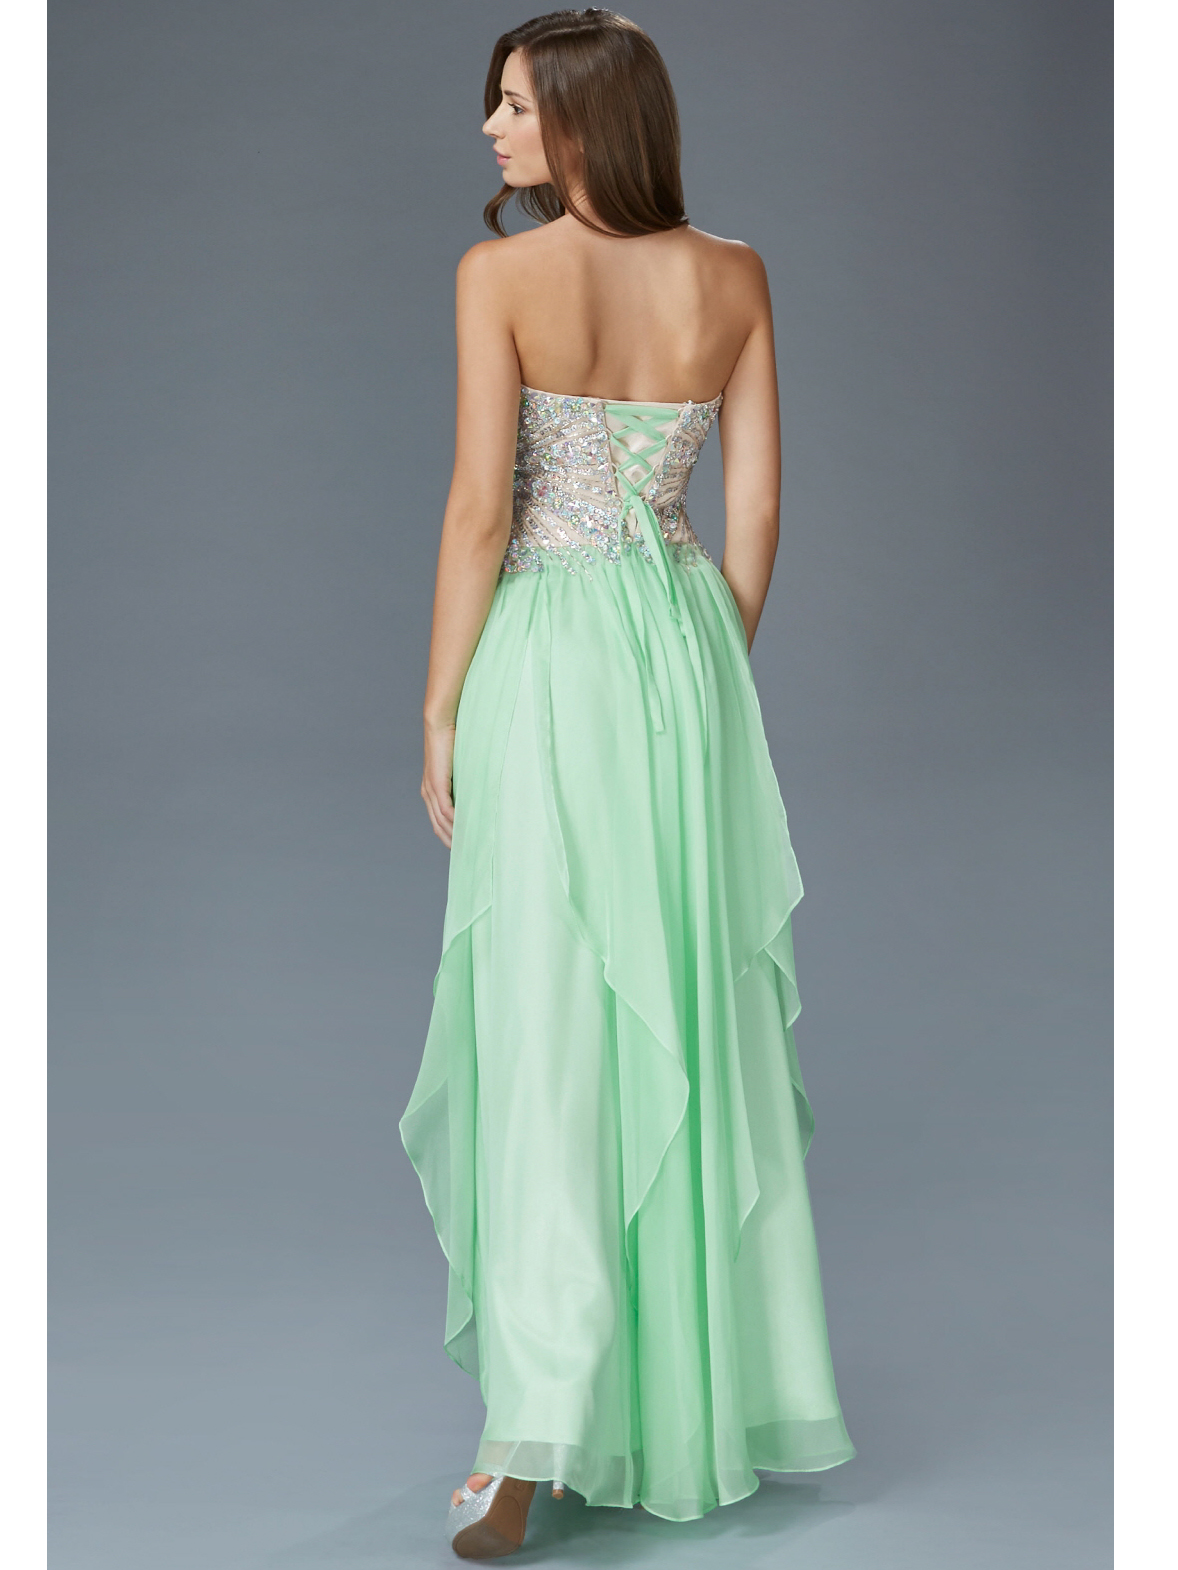 embellished bodice strapless prom dress sung boutique la